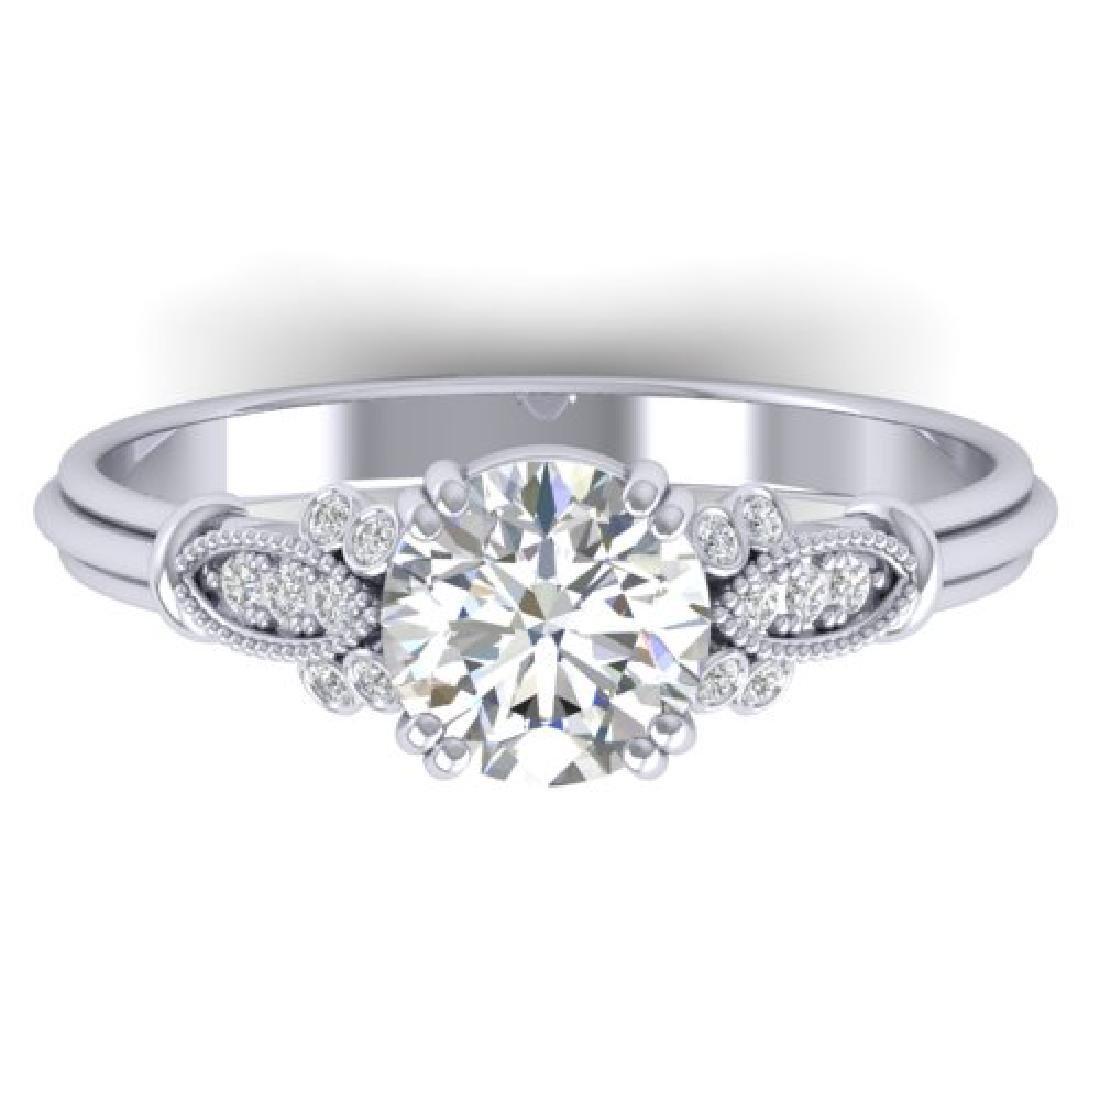 1.15 CTW Certified VS/SI Diamond Solitaire Art Deco